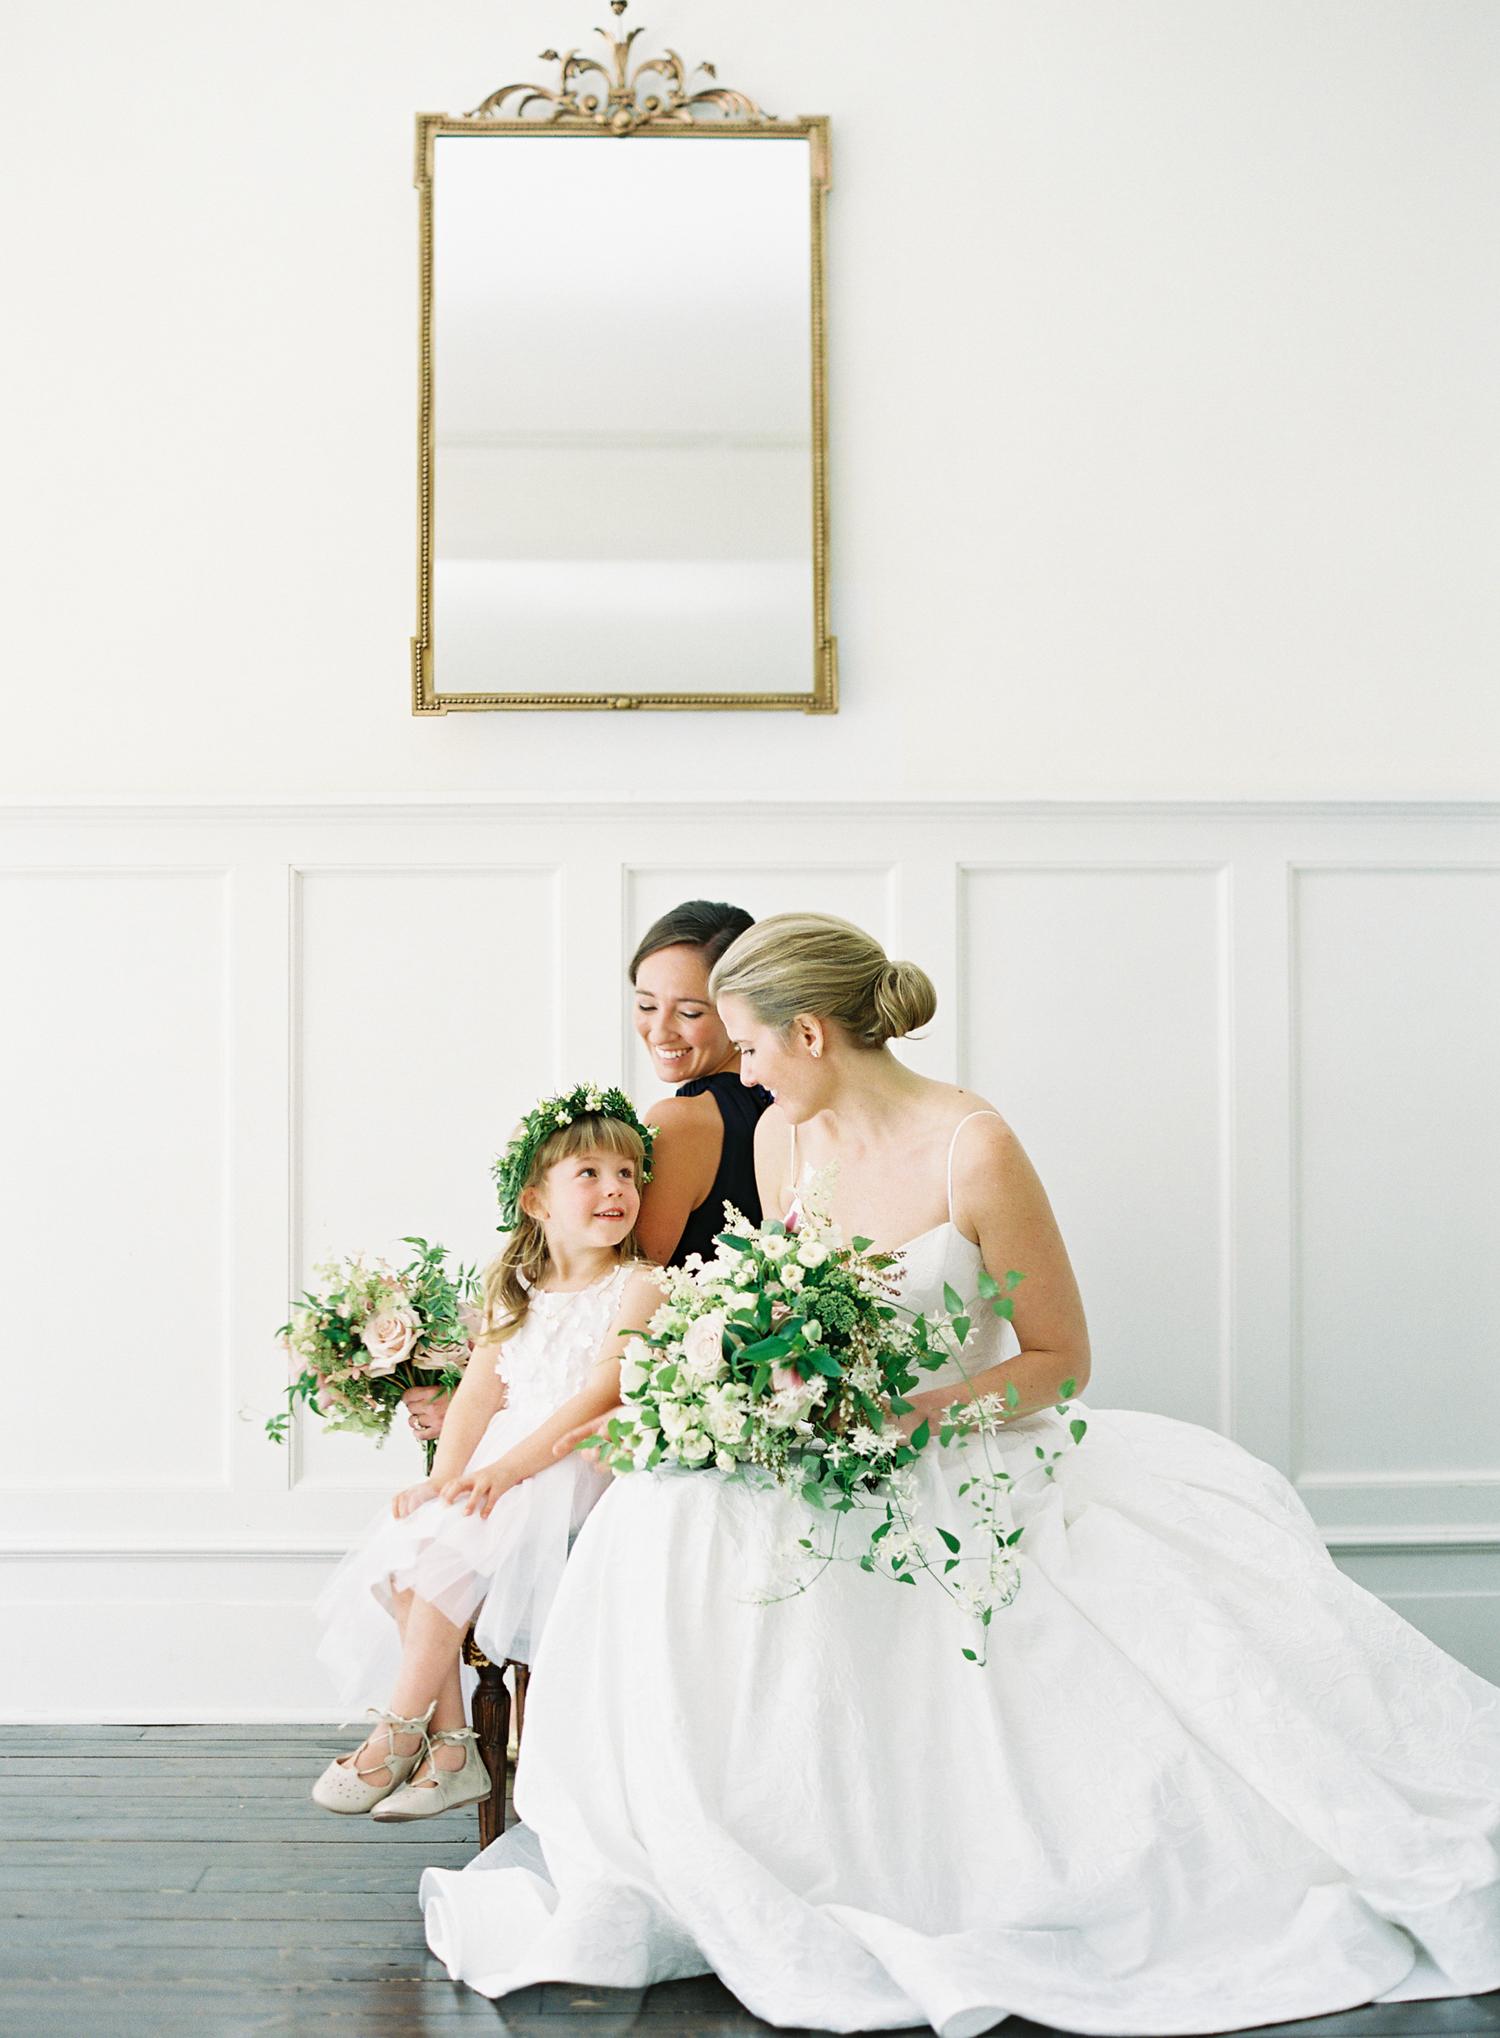 Redding-Connecticut-Wedding-21.jpg